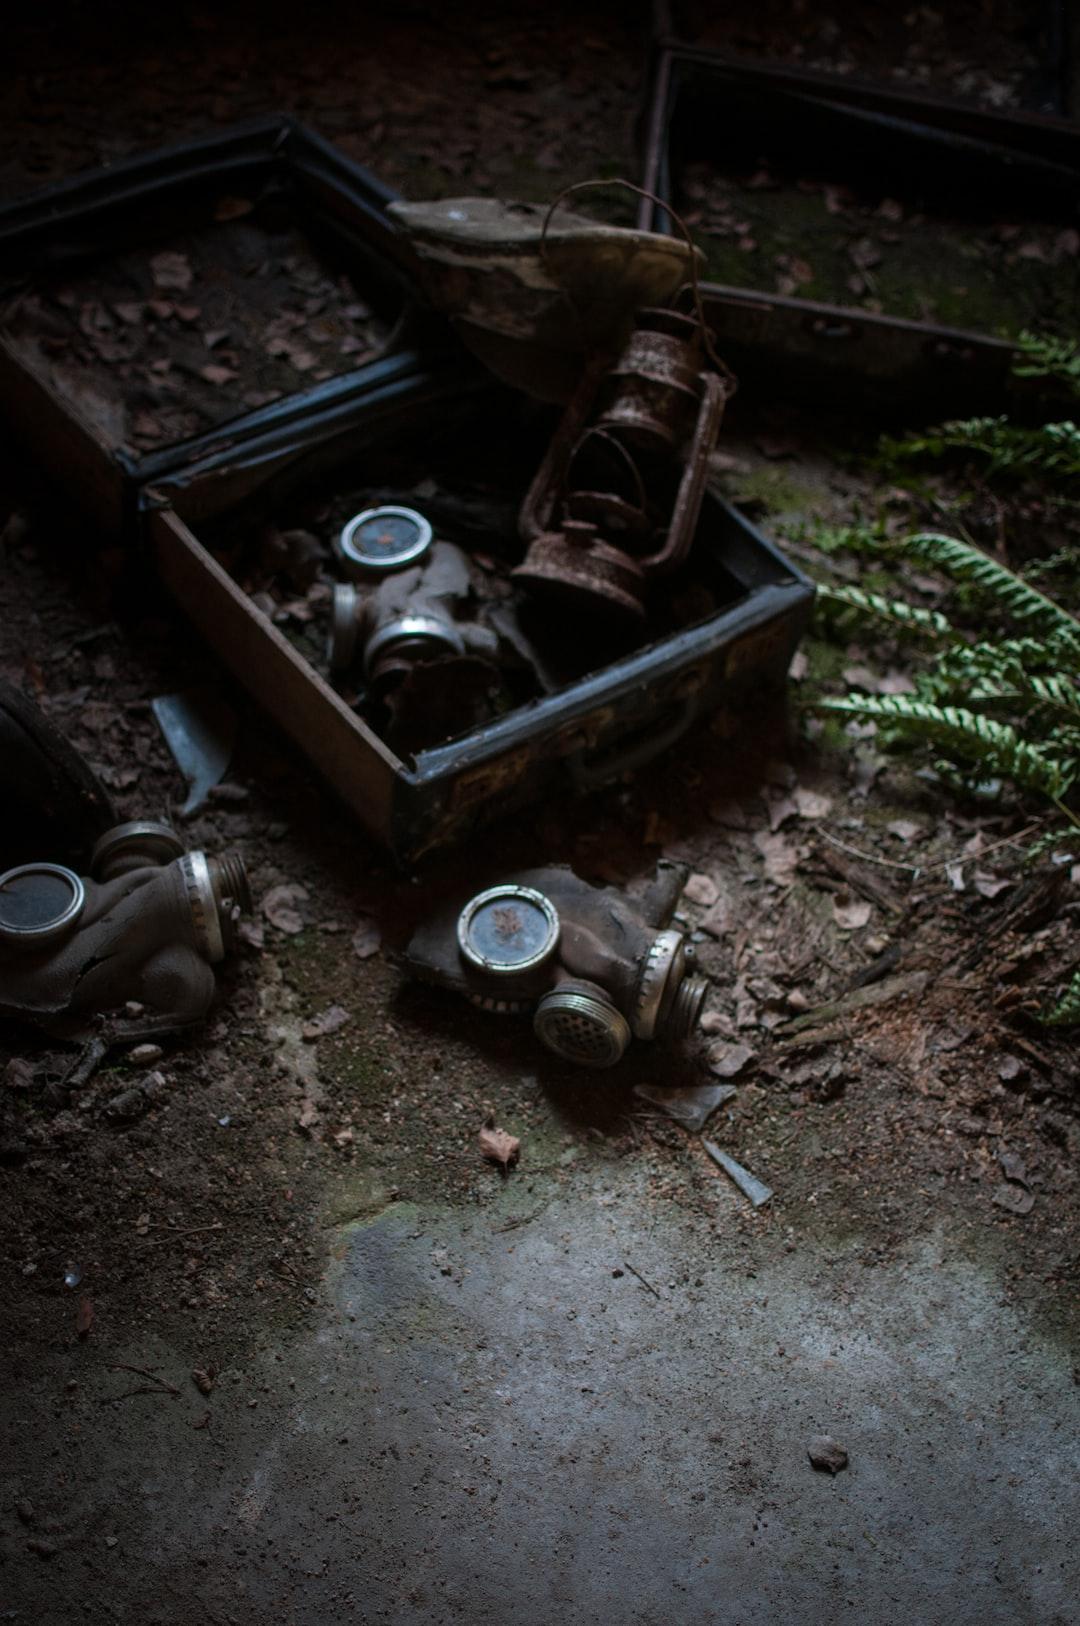 Some old gas masks found in an old Soviet tank barracks near Berlin